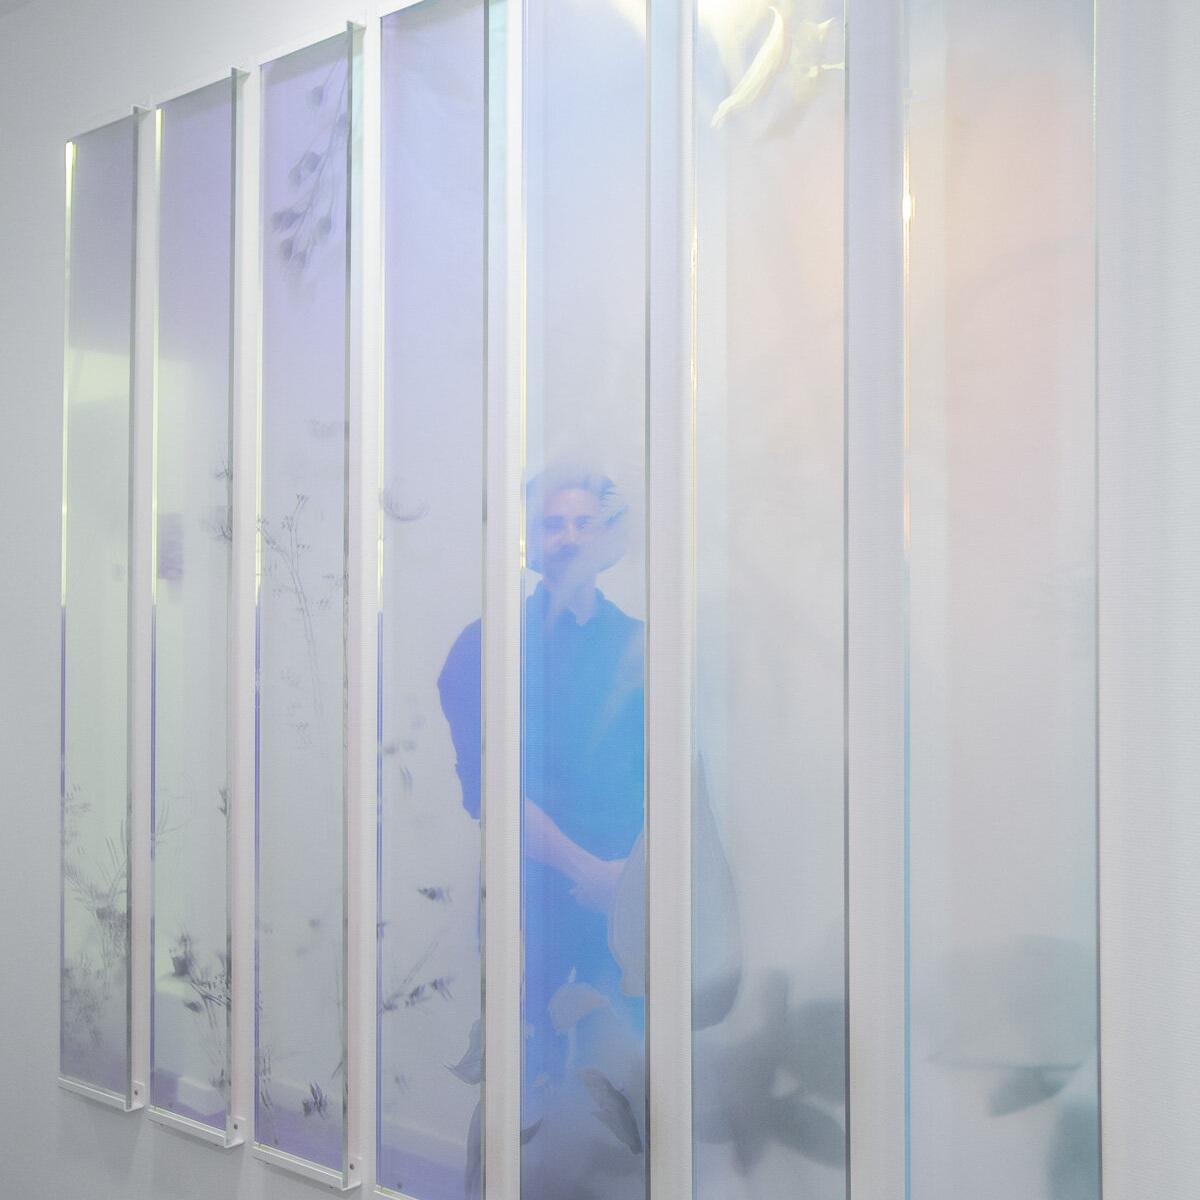 Zahnarzt-Praxis-Doerthe-Fischer-Wuerzburg-kunst-installation-michael-acapulco-1162-2.jpg